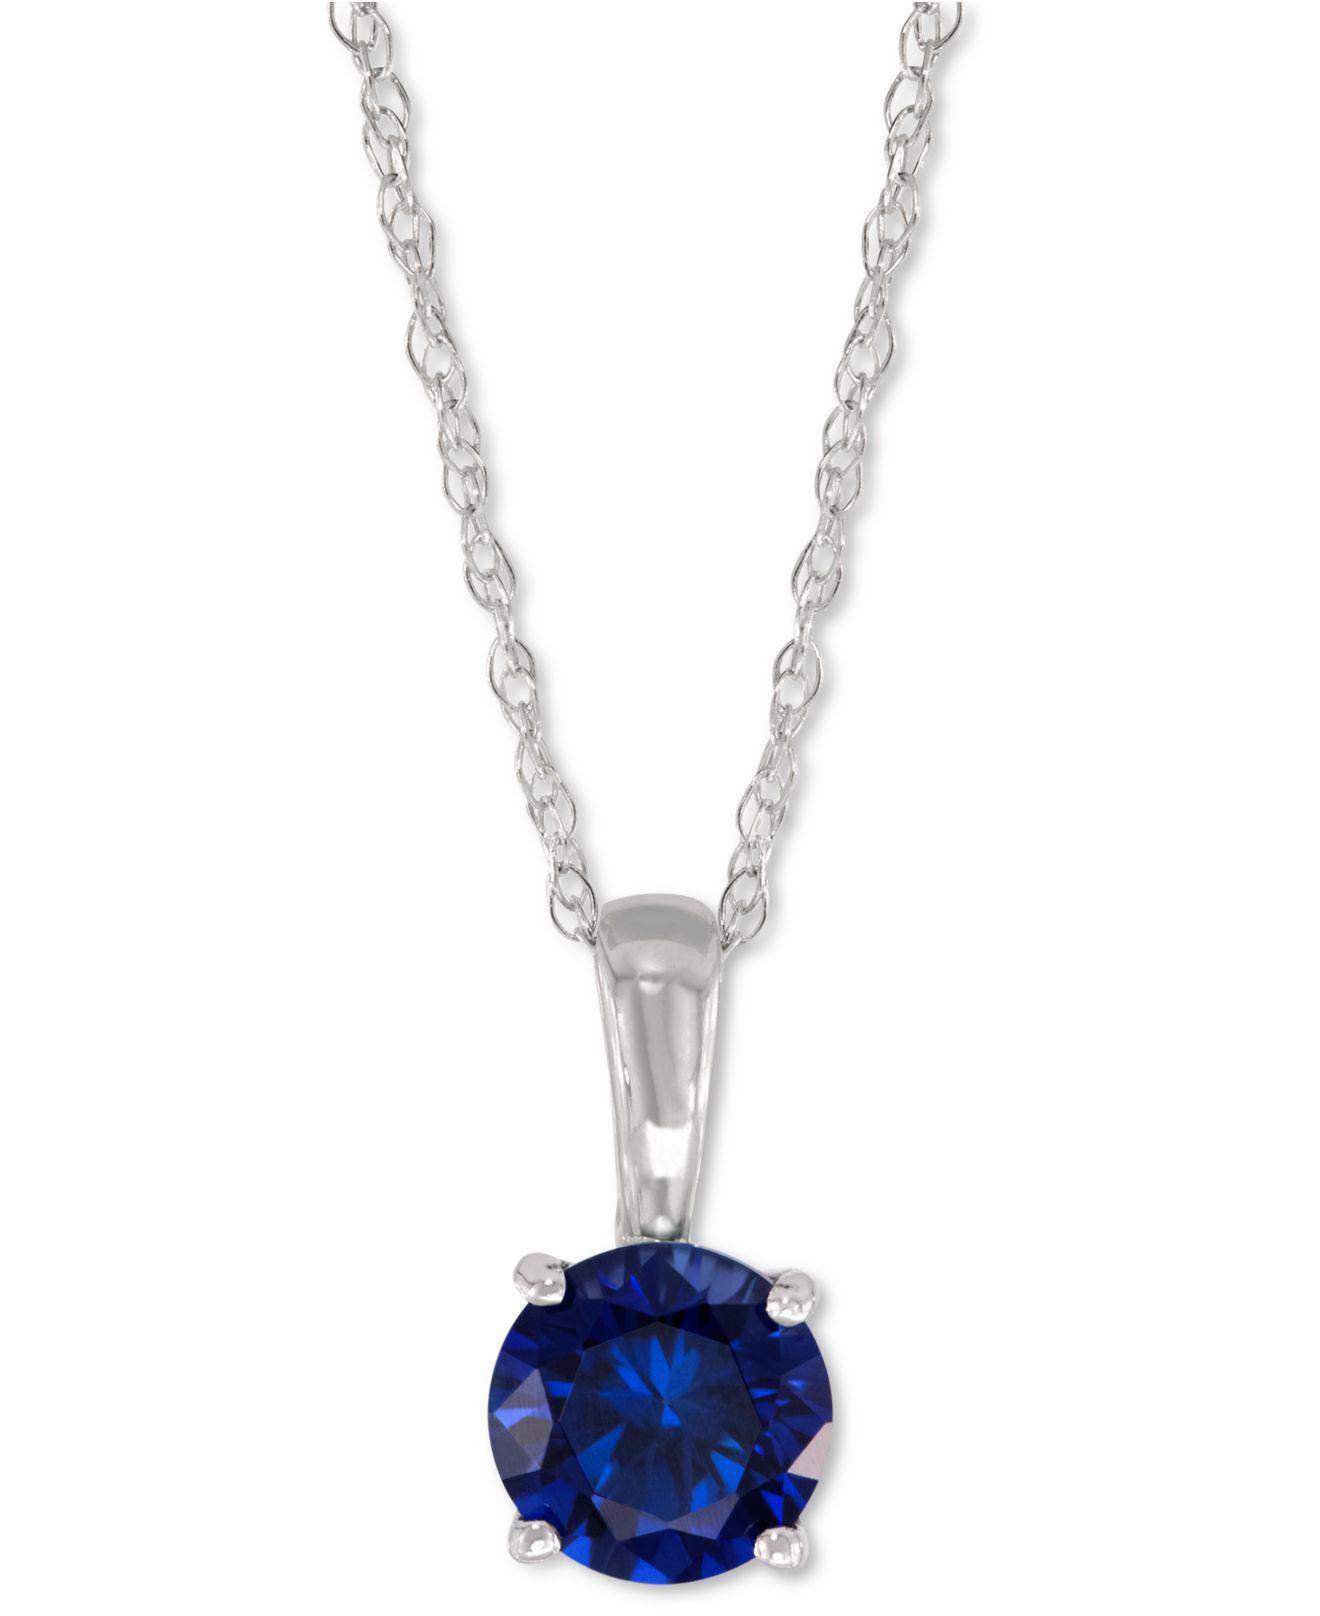 Lyst macys lab created sapphire pendant necklace 58 ct tw macys womens metallic lab created sapphire pendant aloadofball Gallery